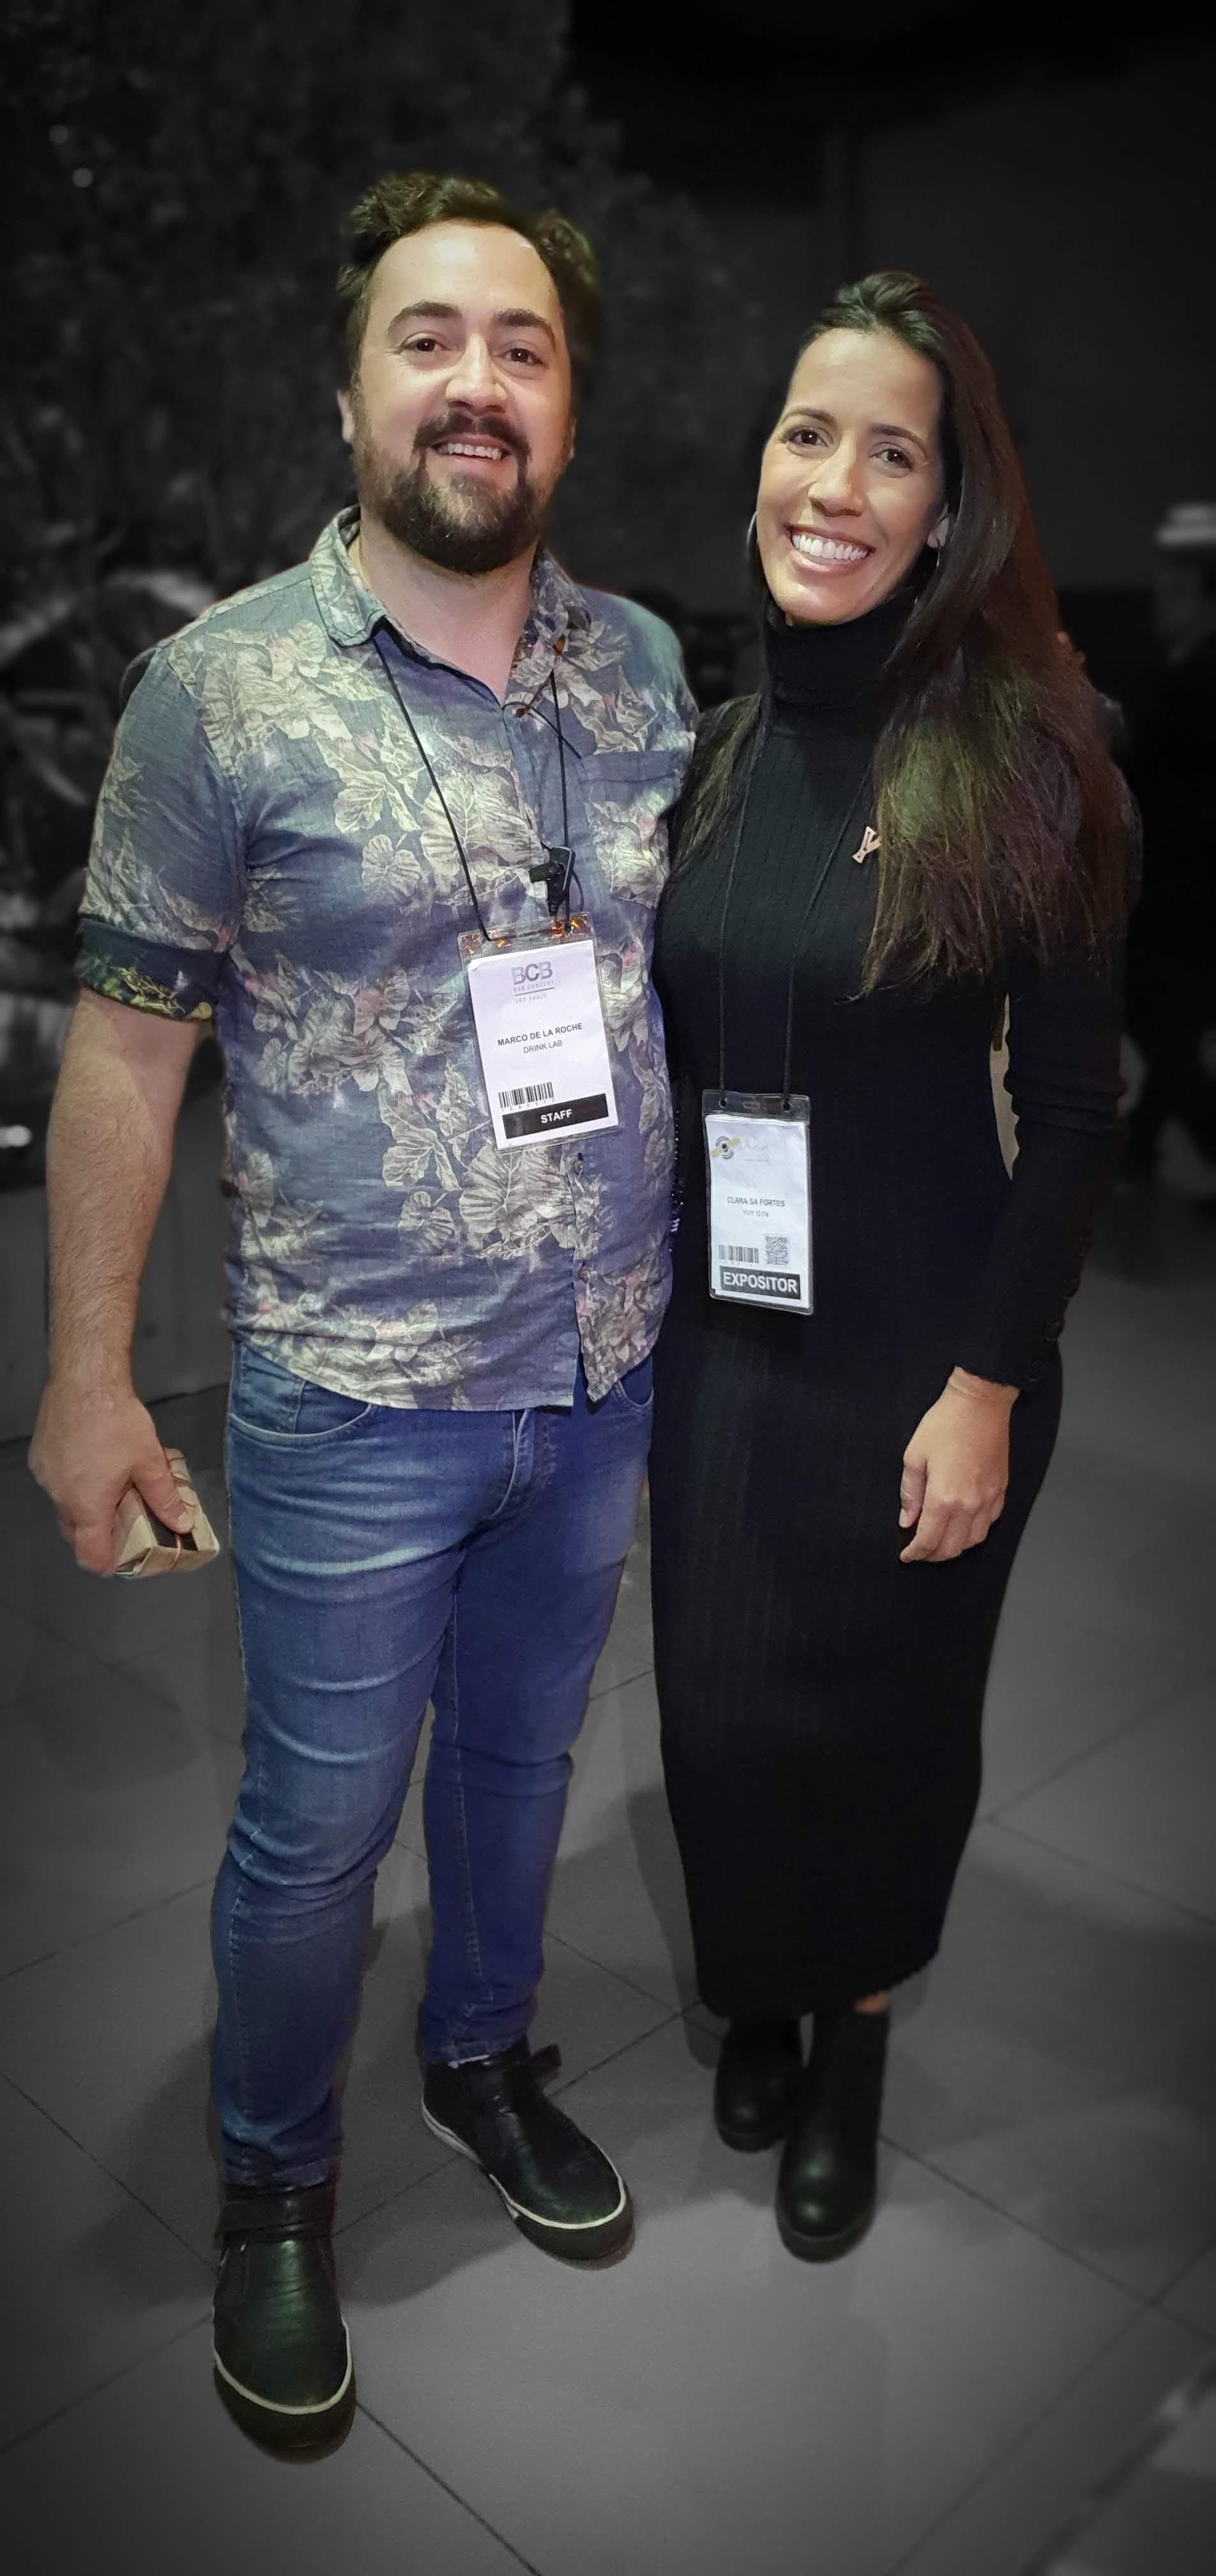 Marco De La Roche e Clara Sá Fortes - Bar Convent São Paulo 2019